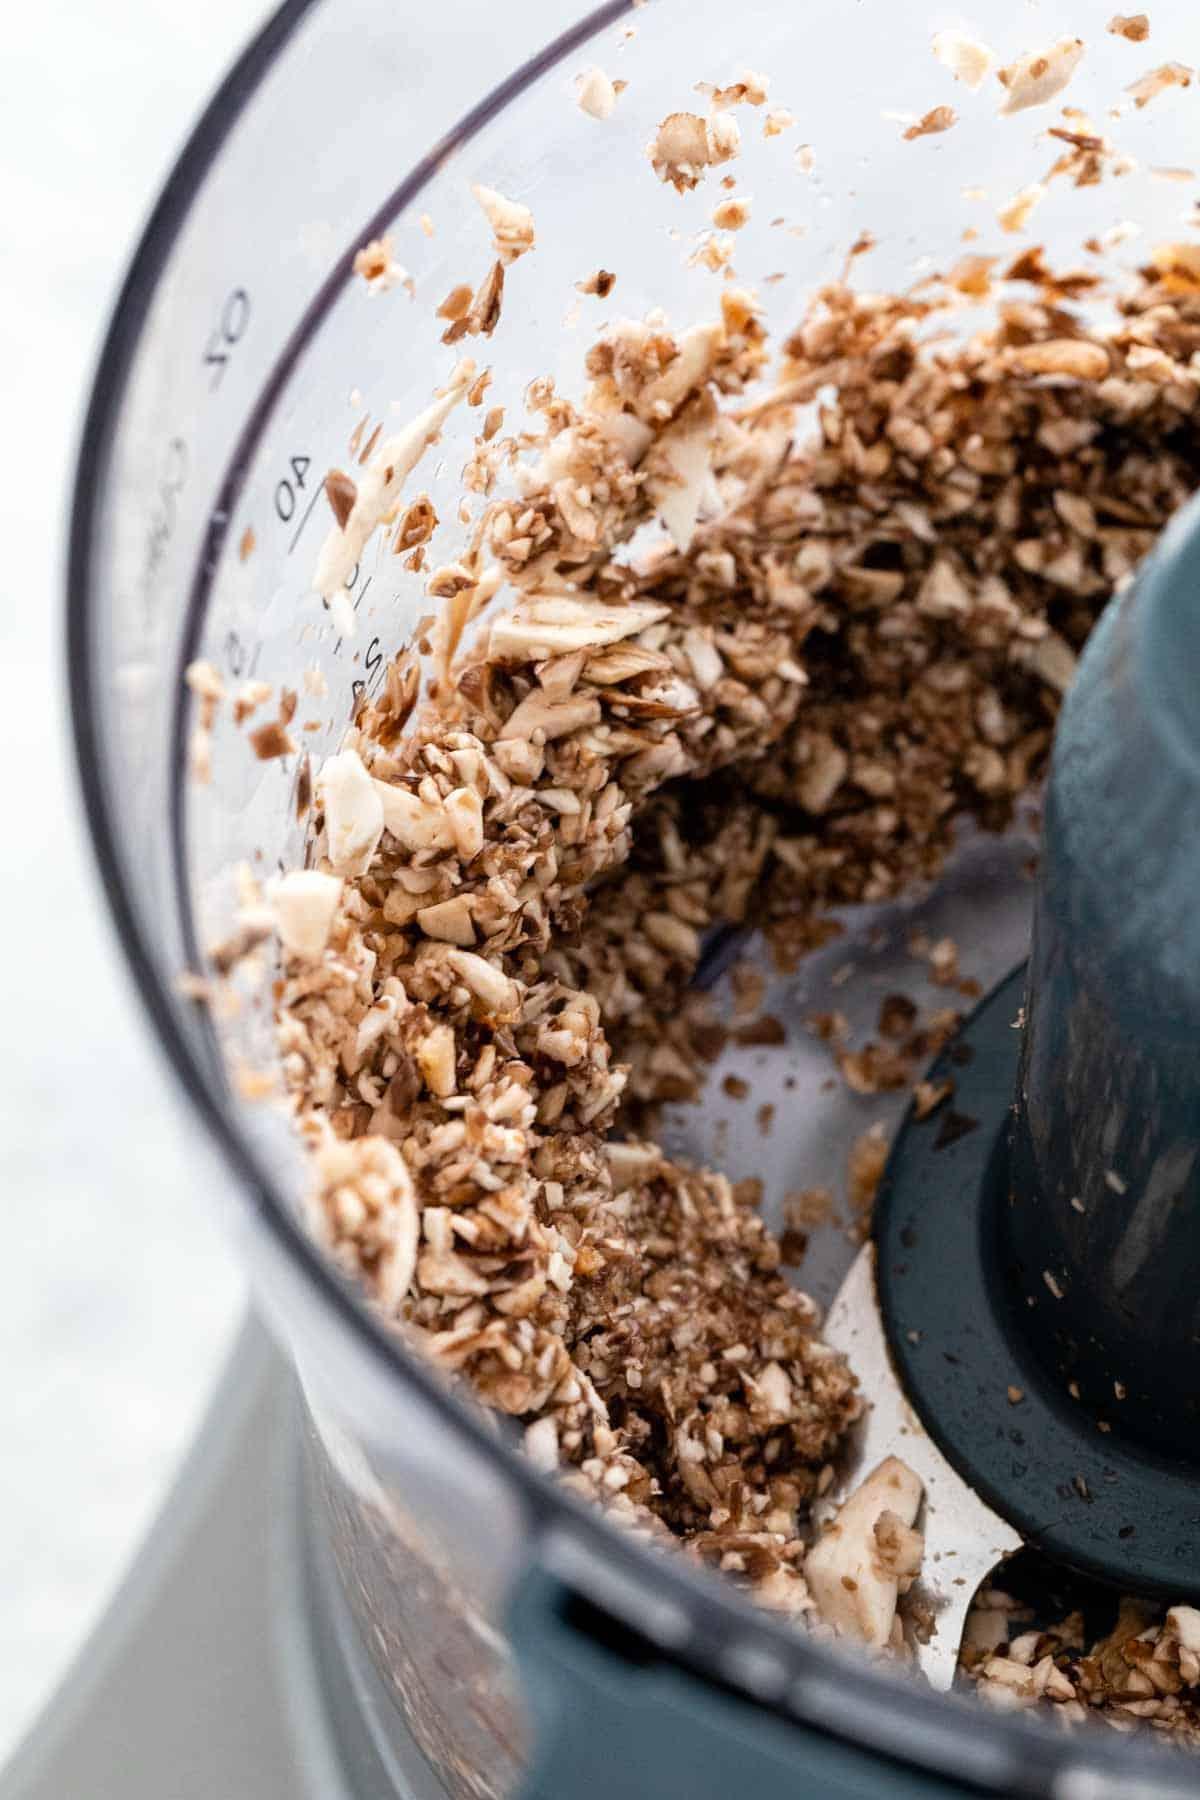 Chopping mushrooms in a food processor